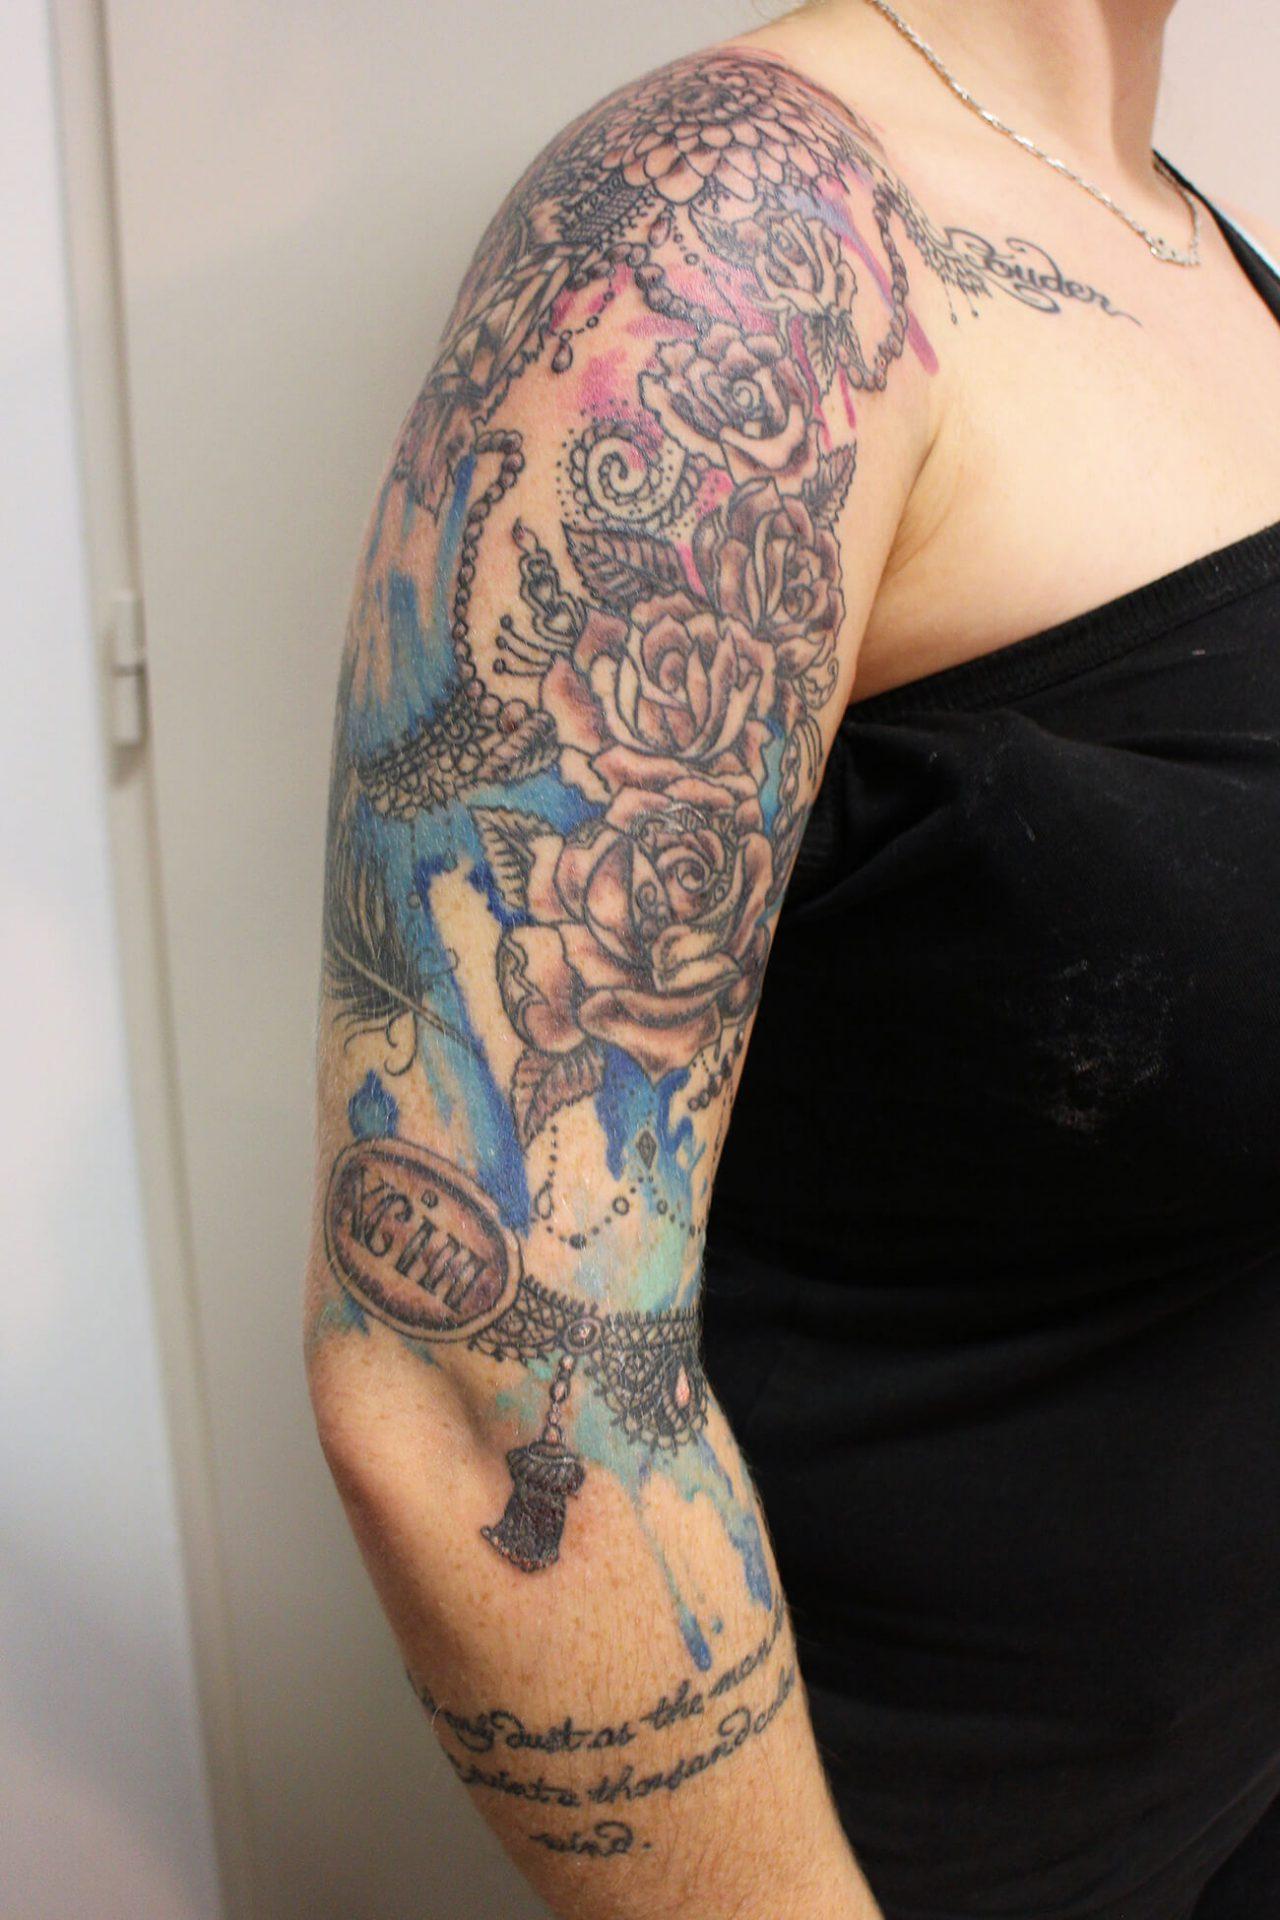 Cosmopolitan Tattoo - Création bras femme, motif floral, tatouage aquarelle , couleur girly